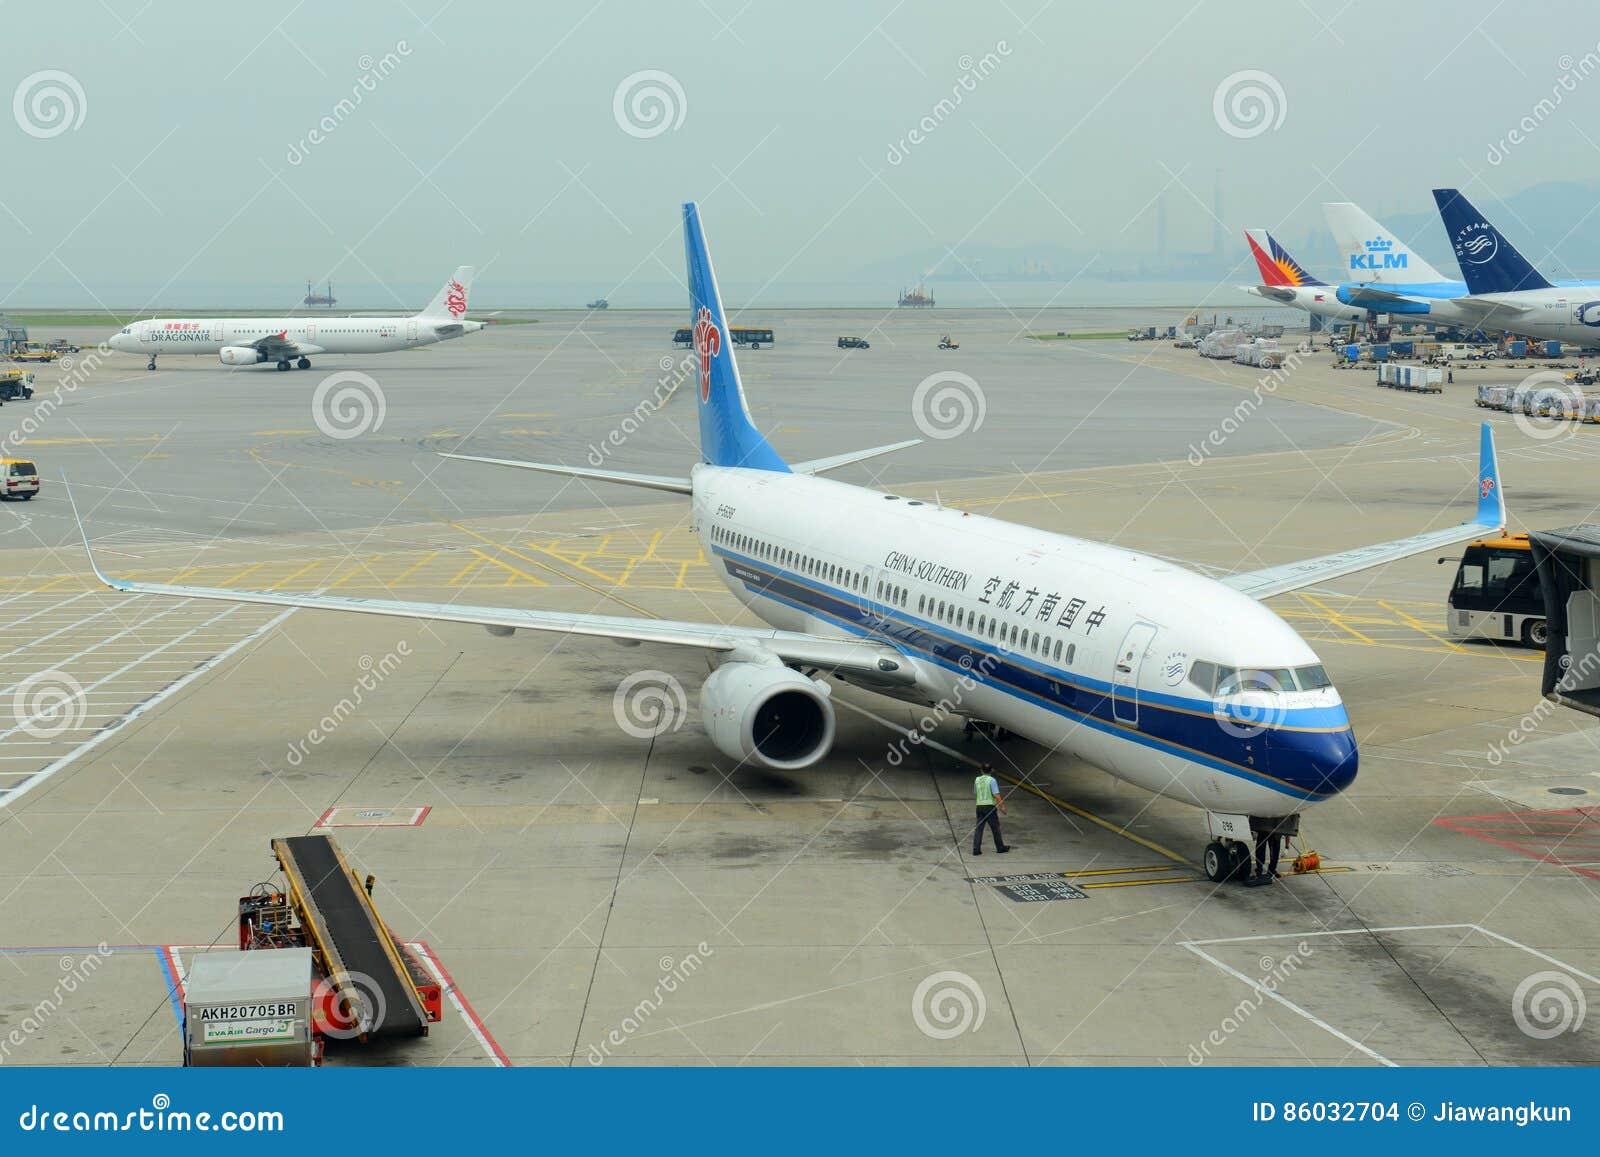 China Southern Airlines B737 in Hong Kong Airport